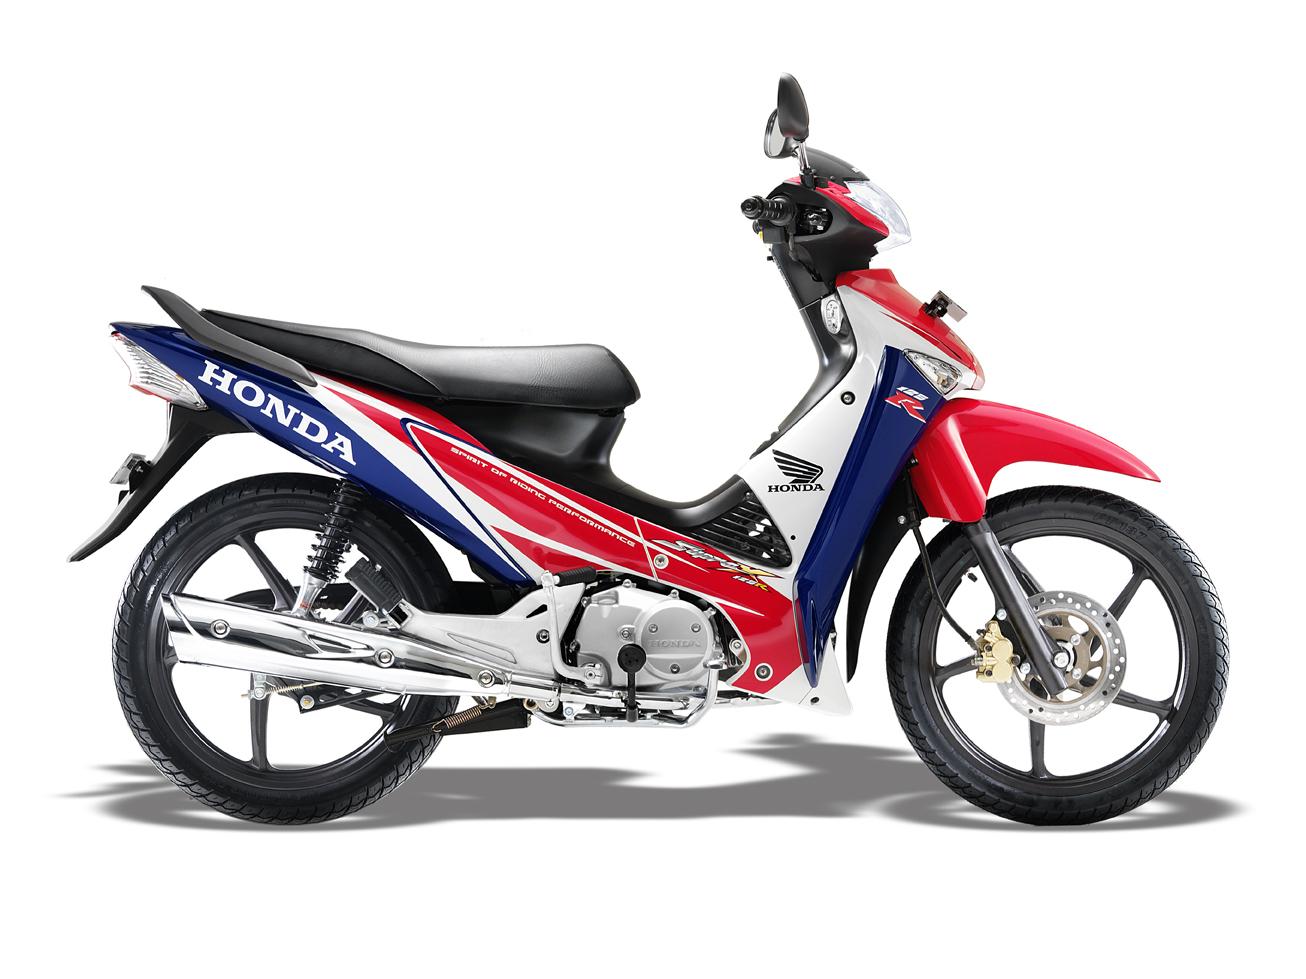 Honda Supra X 125 (HSX125) atau Karisma 125 (K125) identik sebagai ...